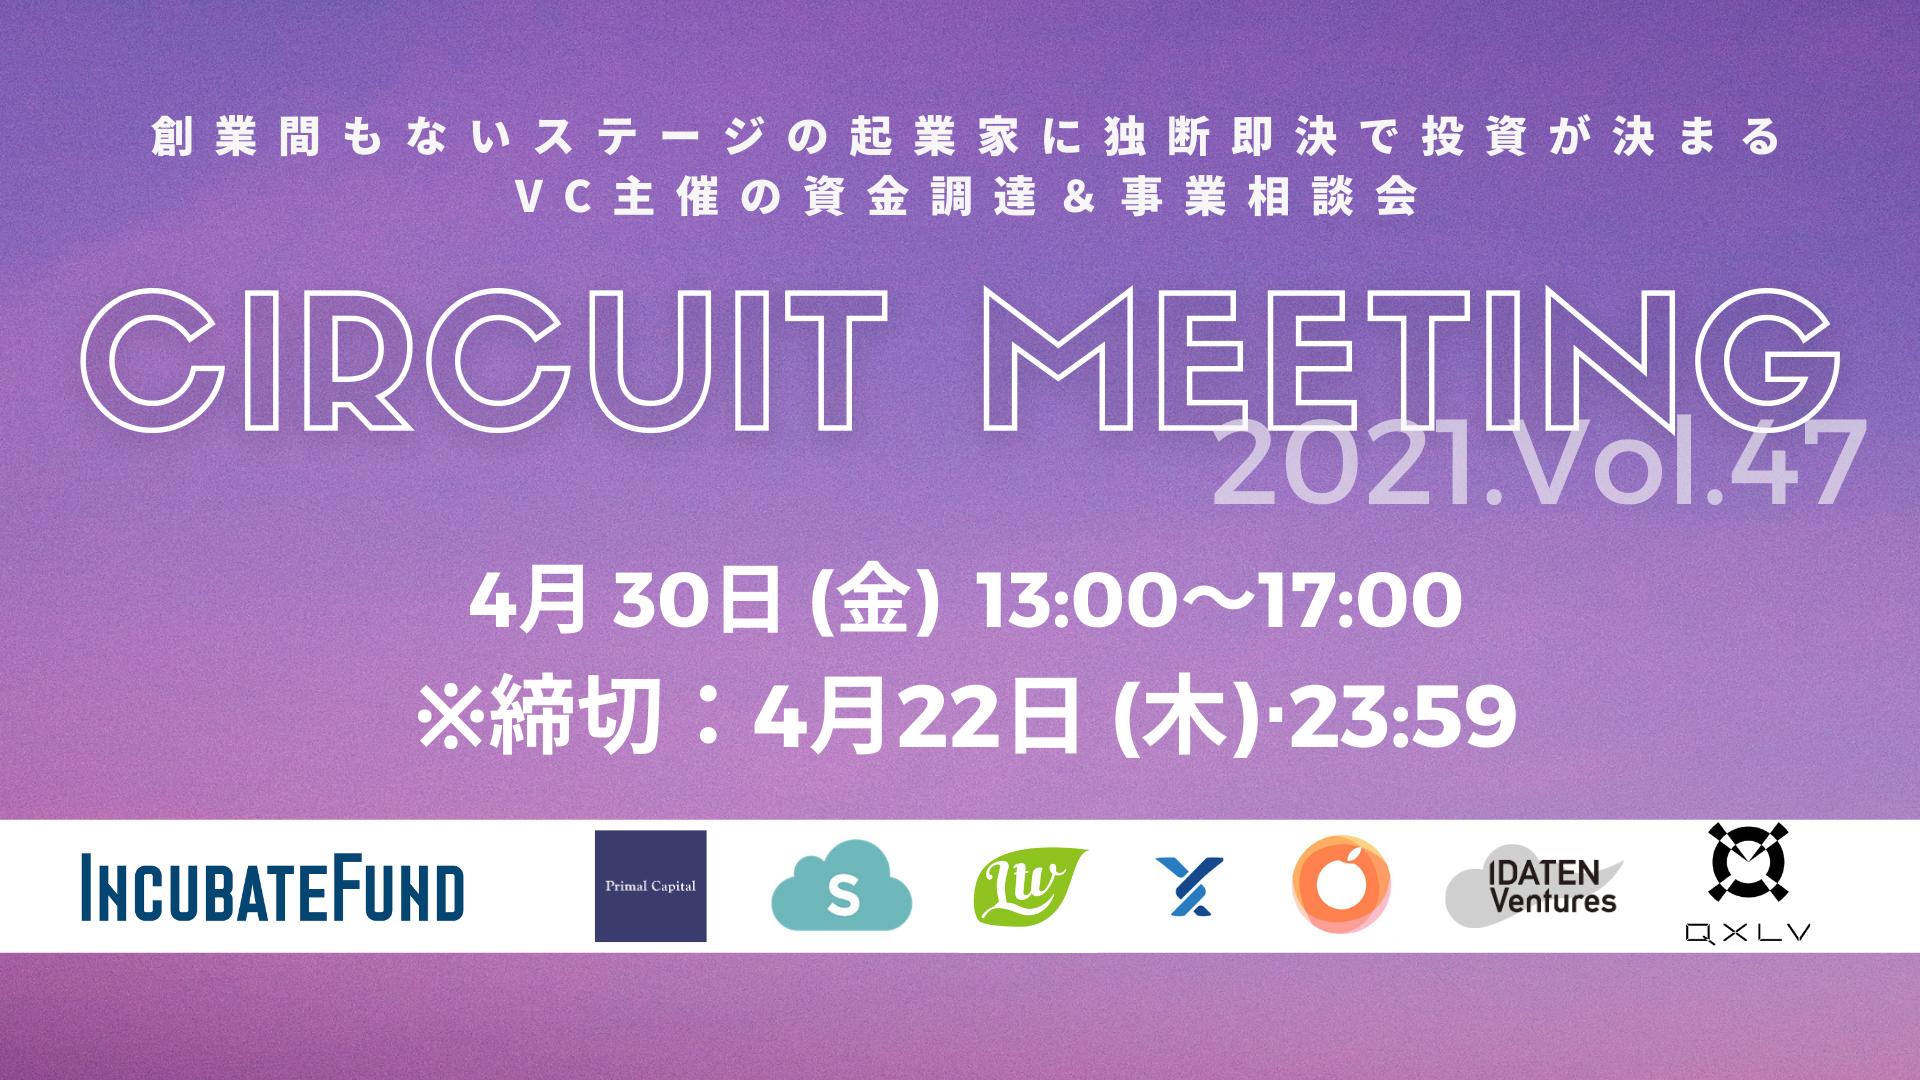 【4/22締切】Circuit Meeting Vol.47